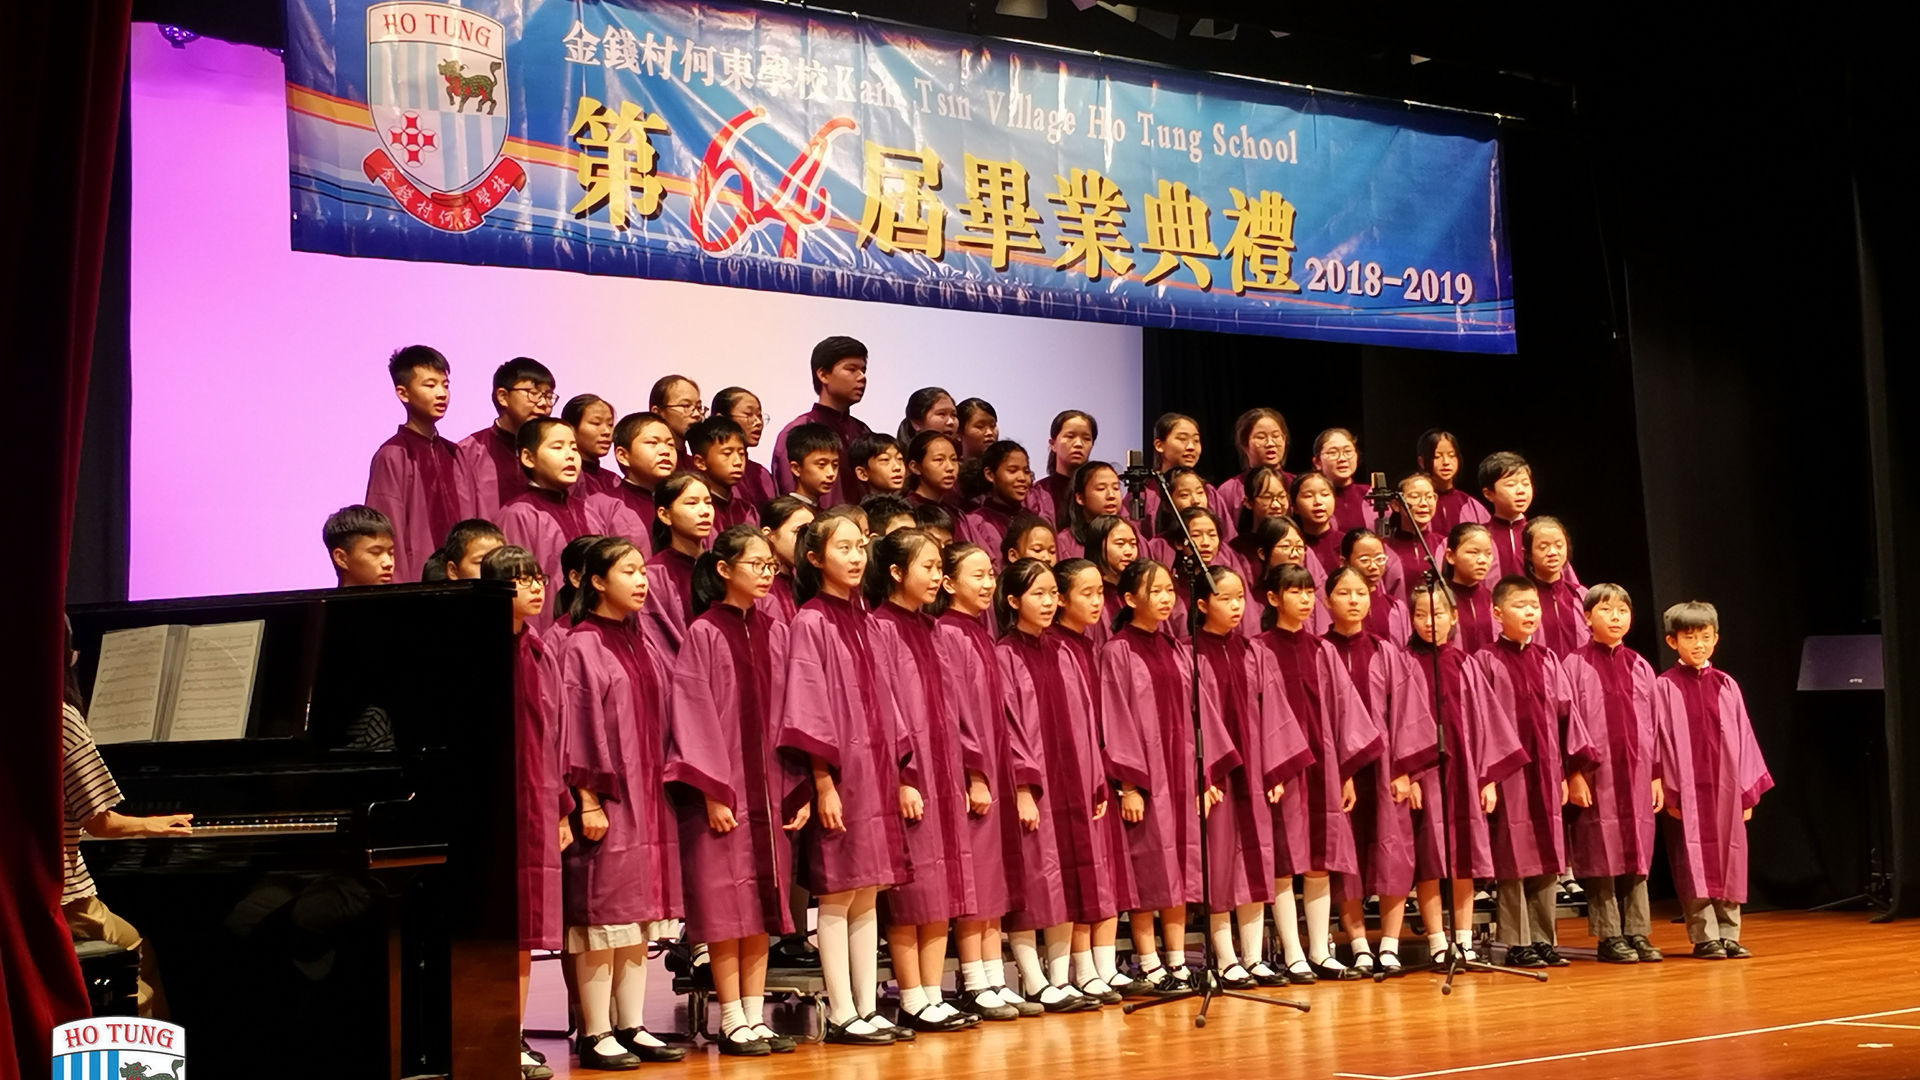 Ho Tung Kam Tsin Village Primary School